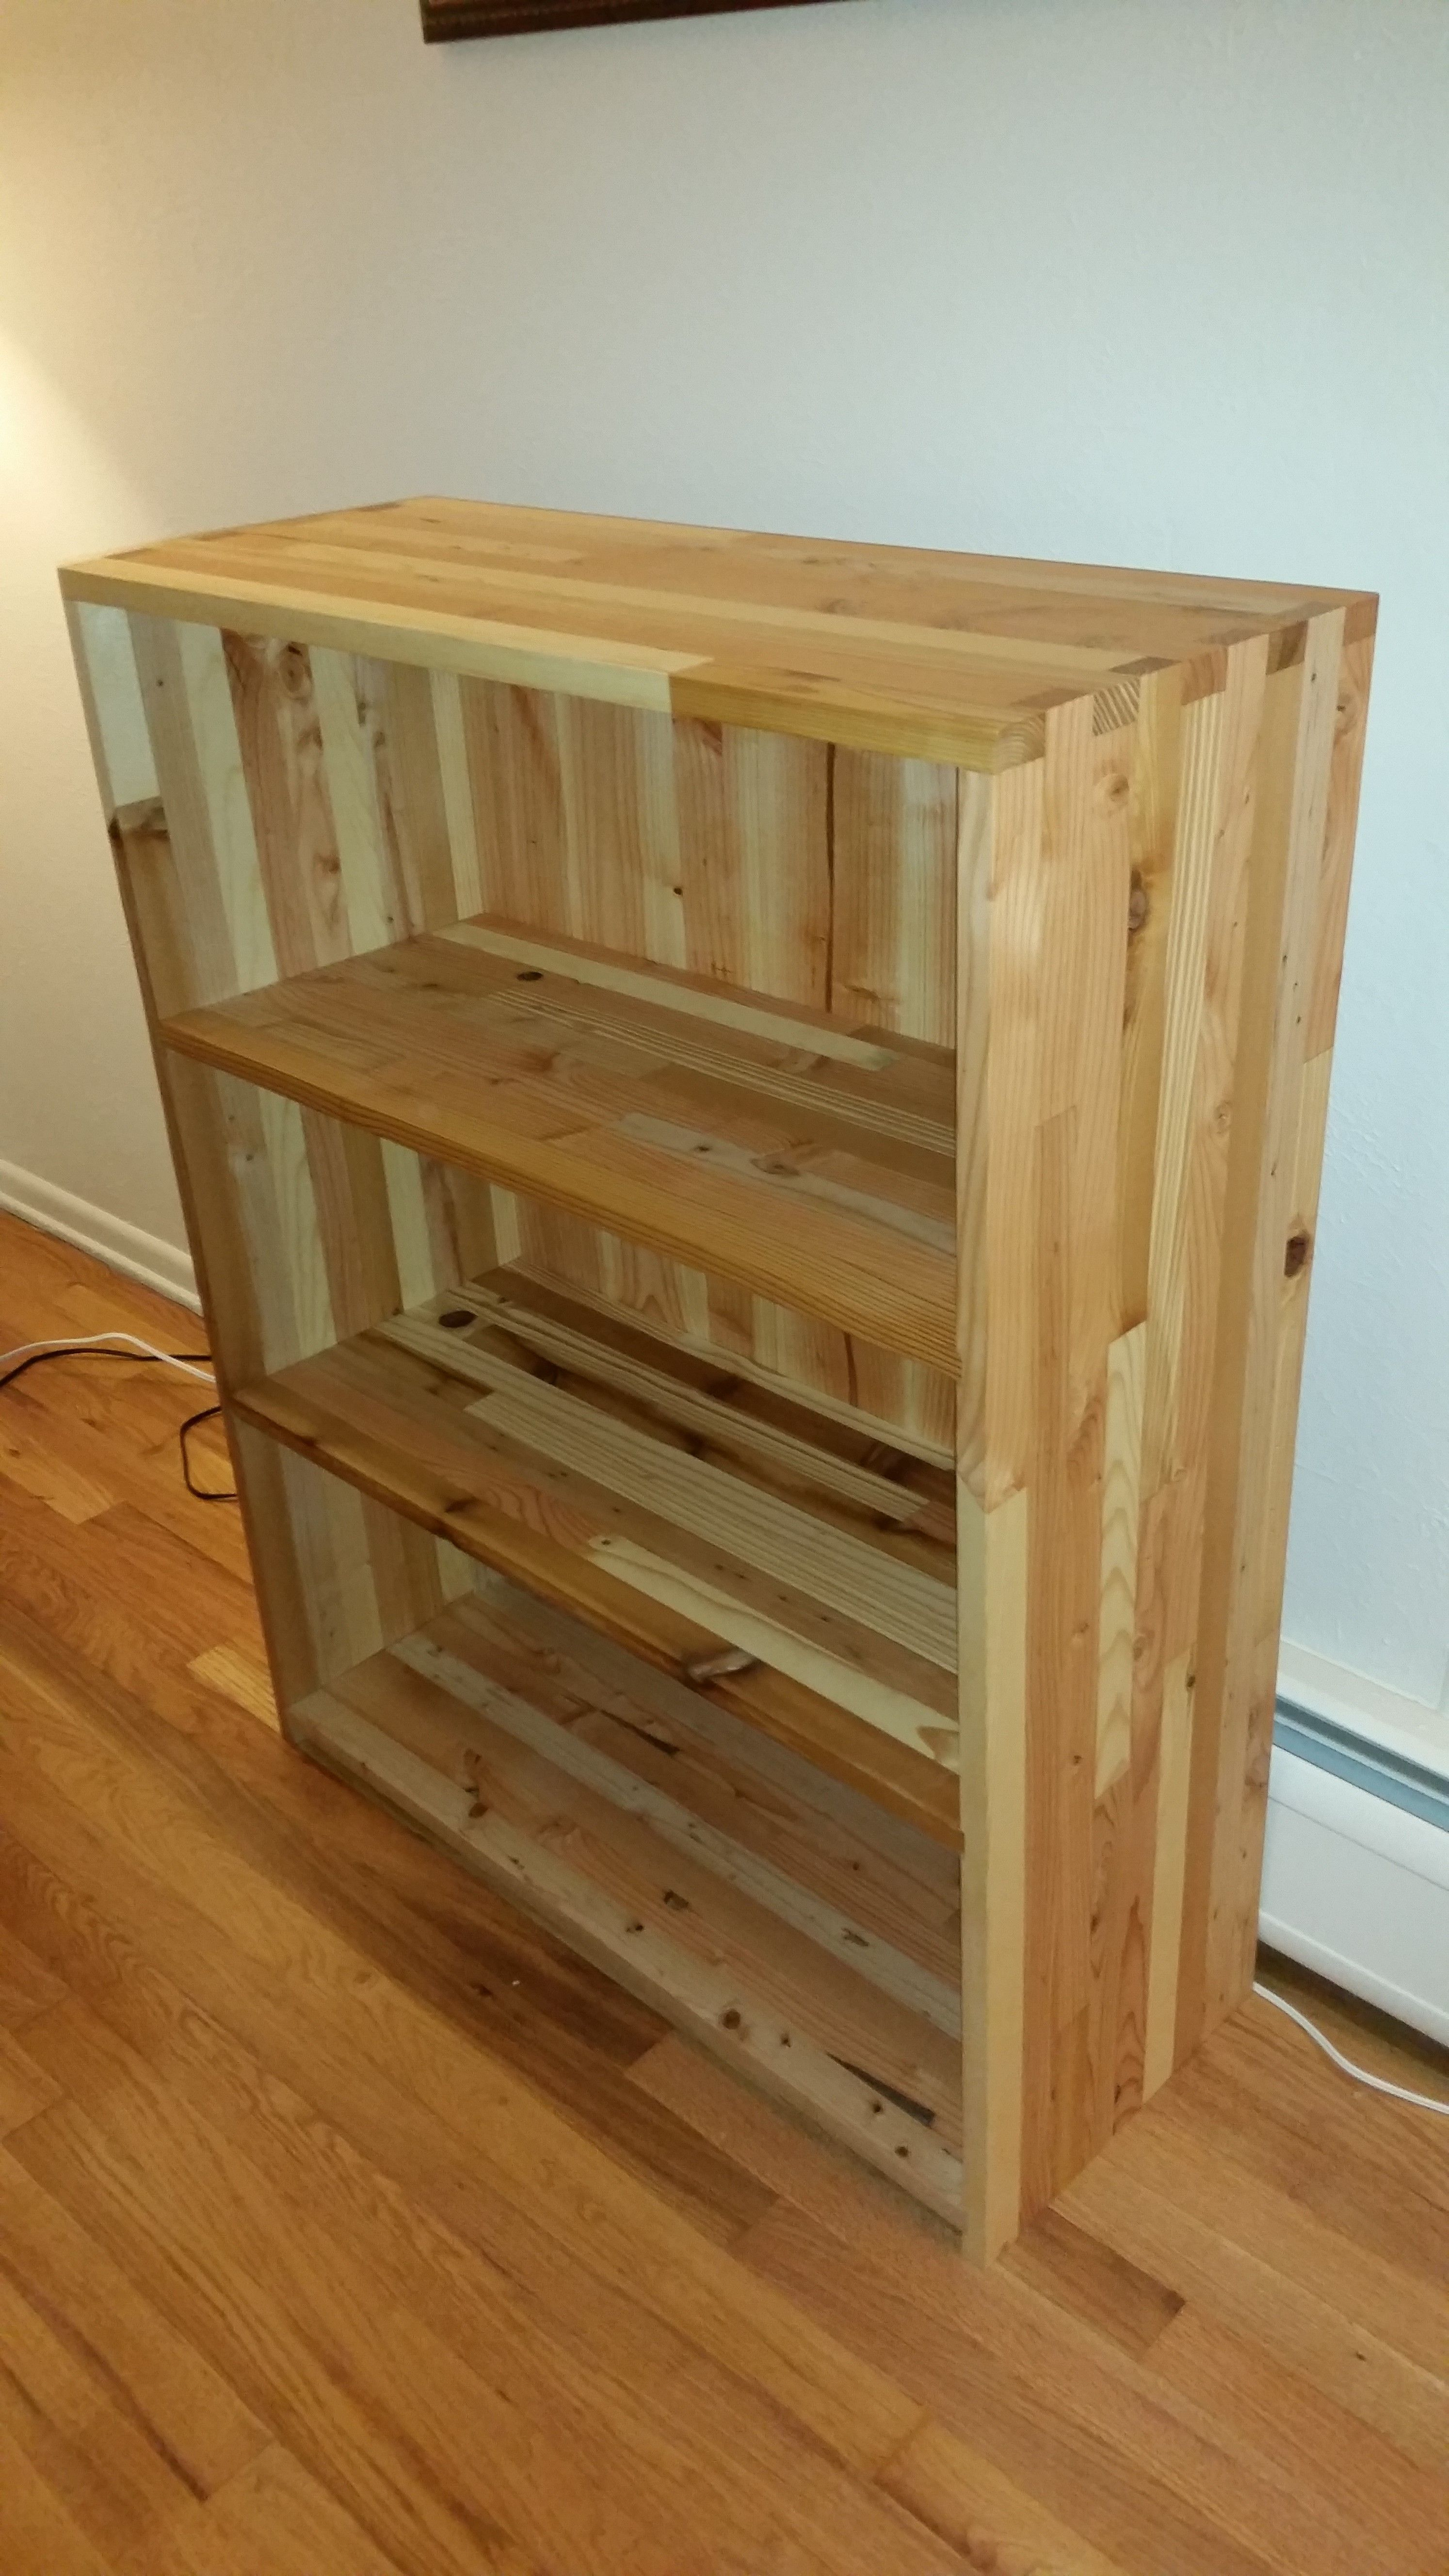 All Natural Reclaimed Coniferous Wood Bookshelf. Made From Douglas Fir,  Ponderosa Pine, Western